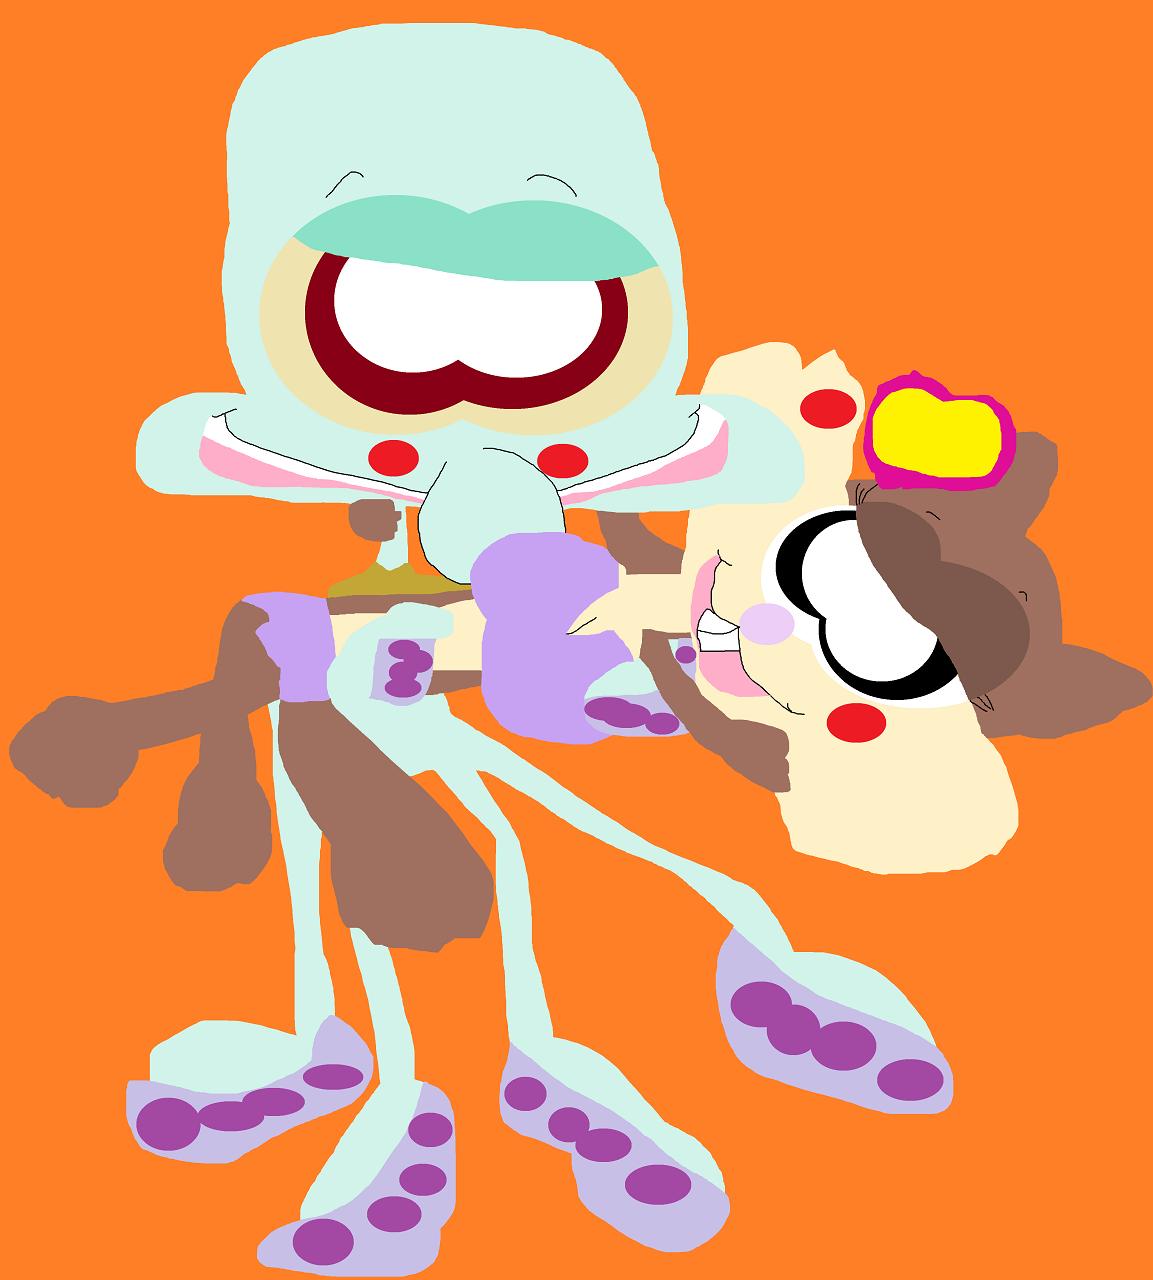 Just A Random Squidward Holding Sandy Again by Falconlobo